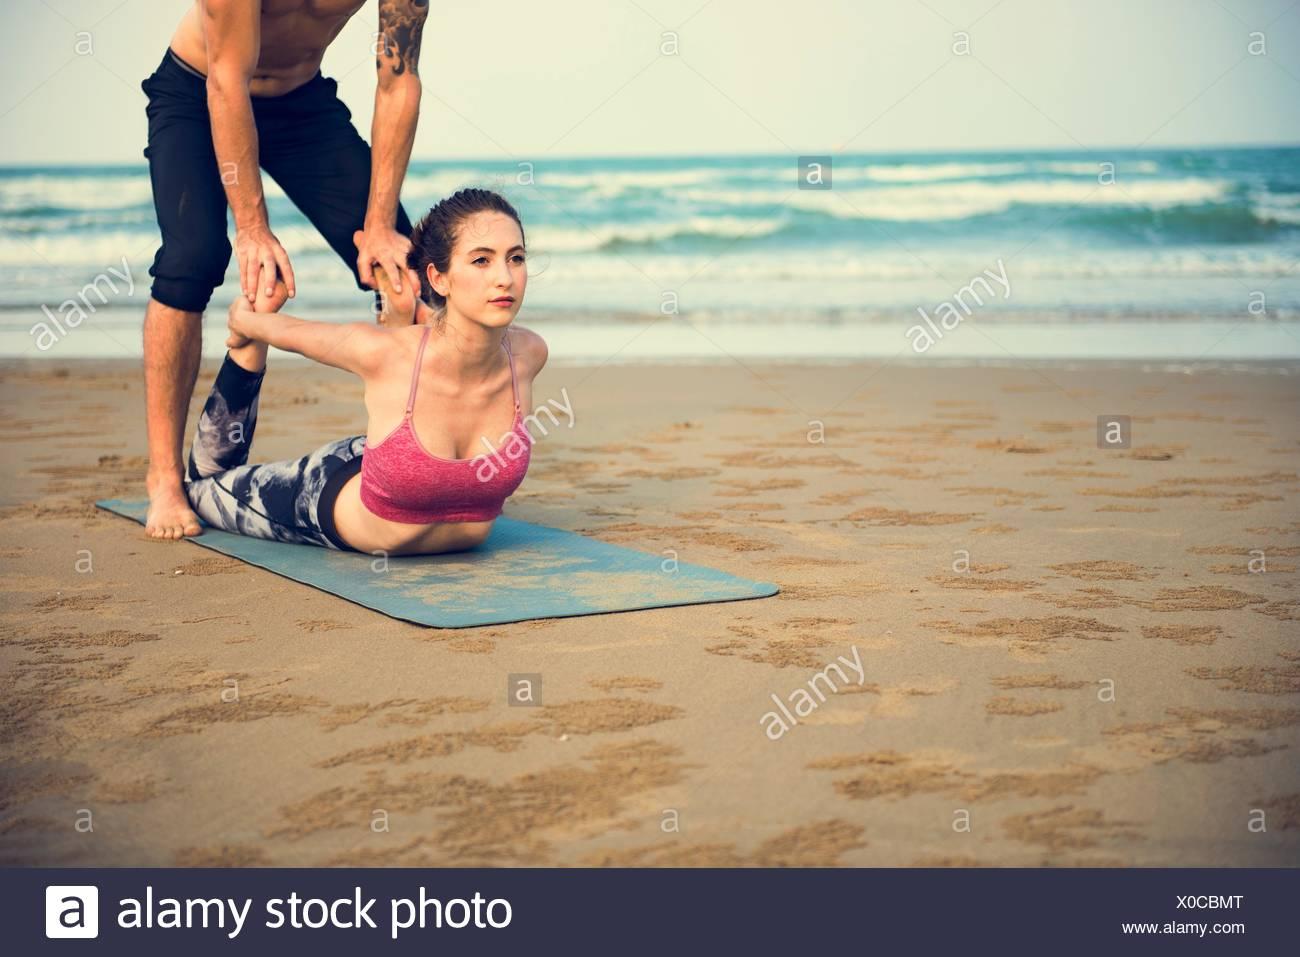 Yoga-Übung Dehnung Meditation Konzentration Sommer Konzept Stockbild